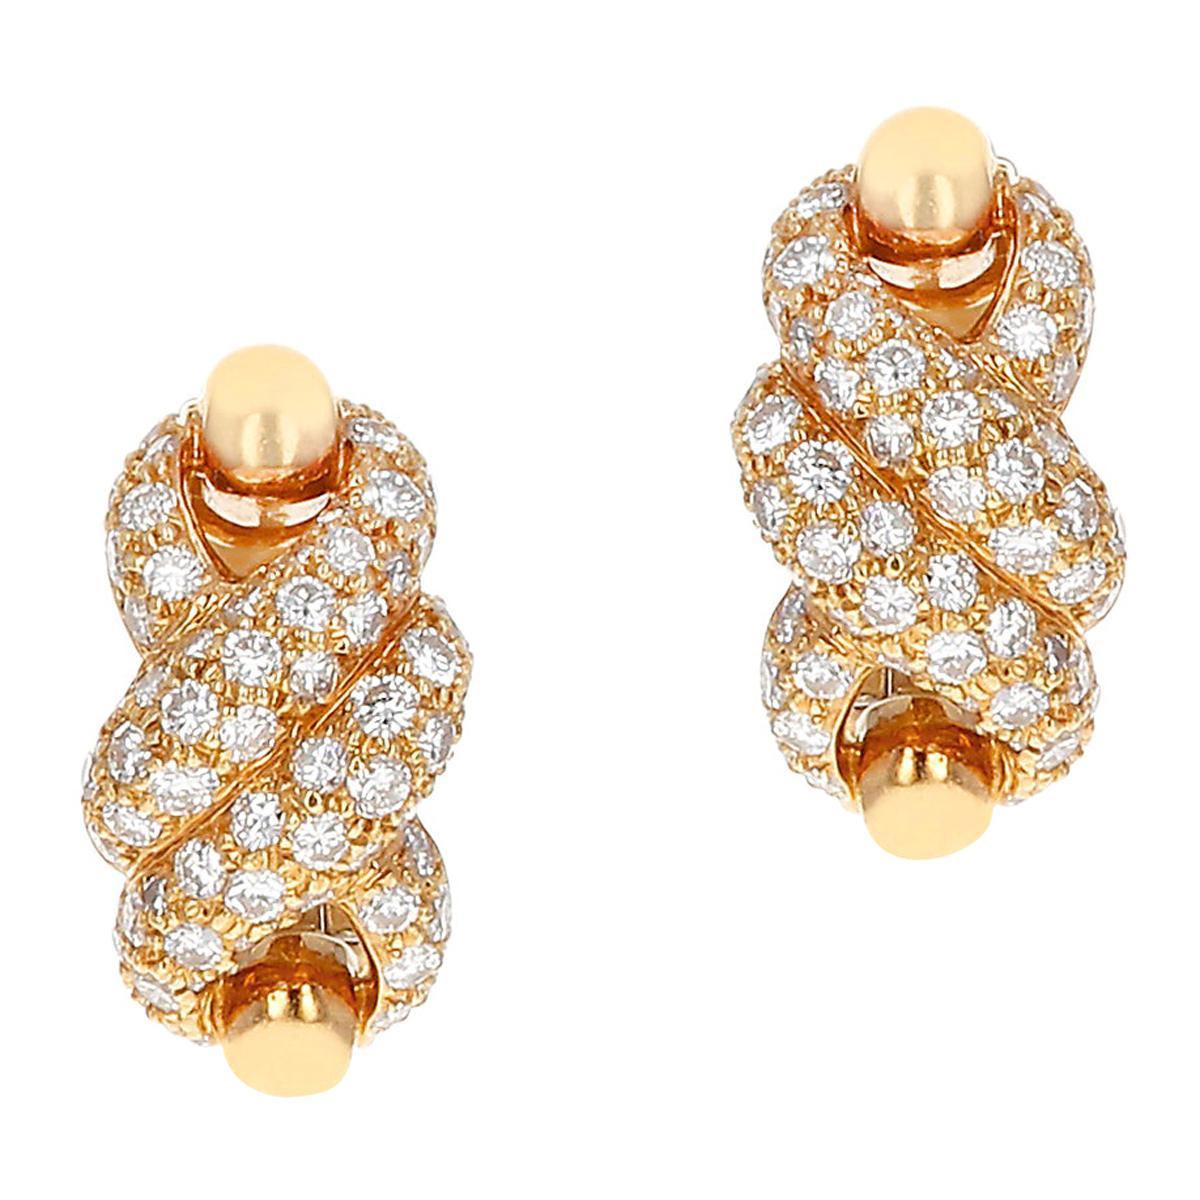 Cartier Twisted Rope Diamond Swirl Earrings, 18 Karat Yellow Gold